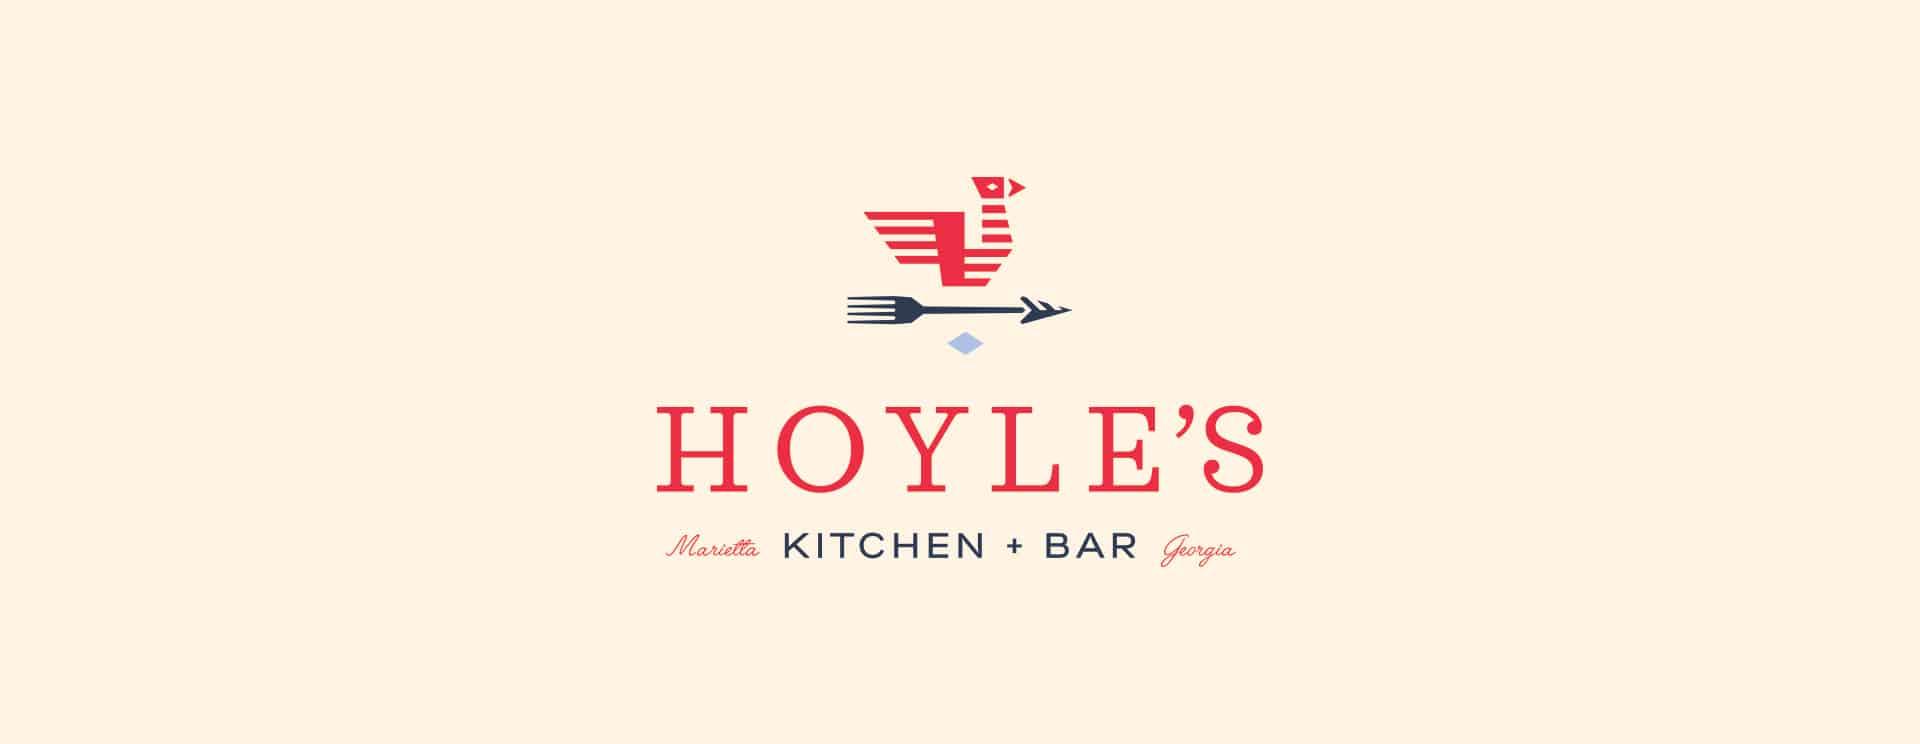 Hoyle's Kitchen & Bar restaurant rebranding and design logo design